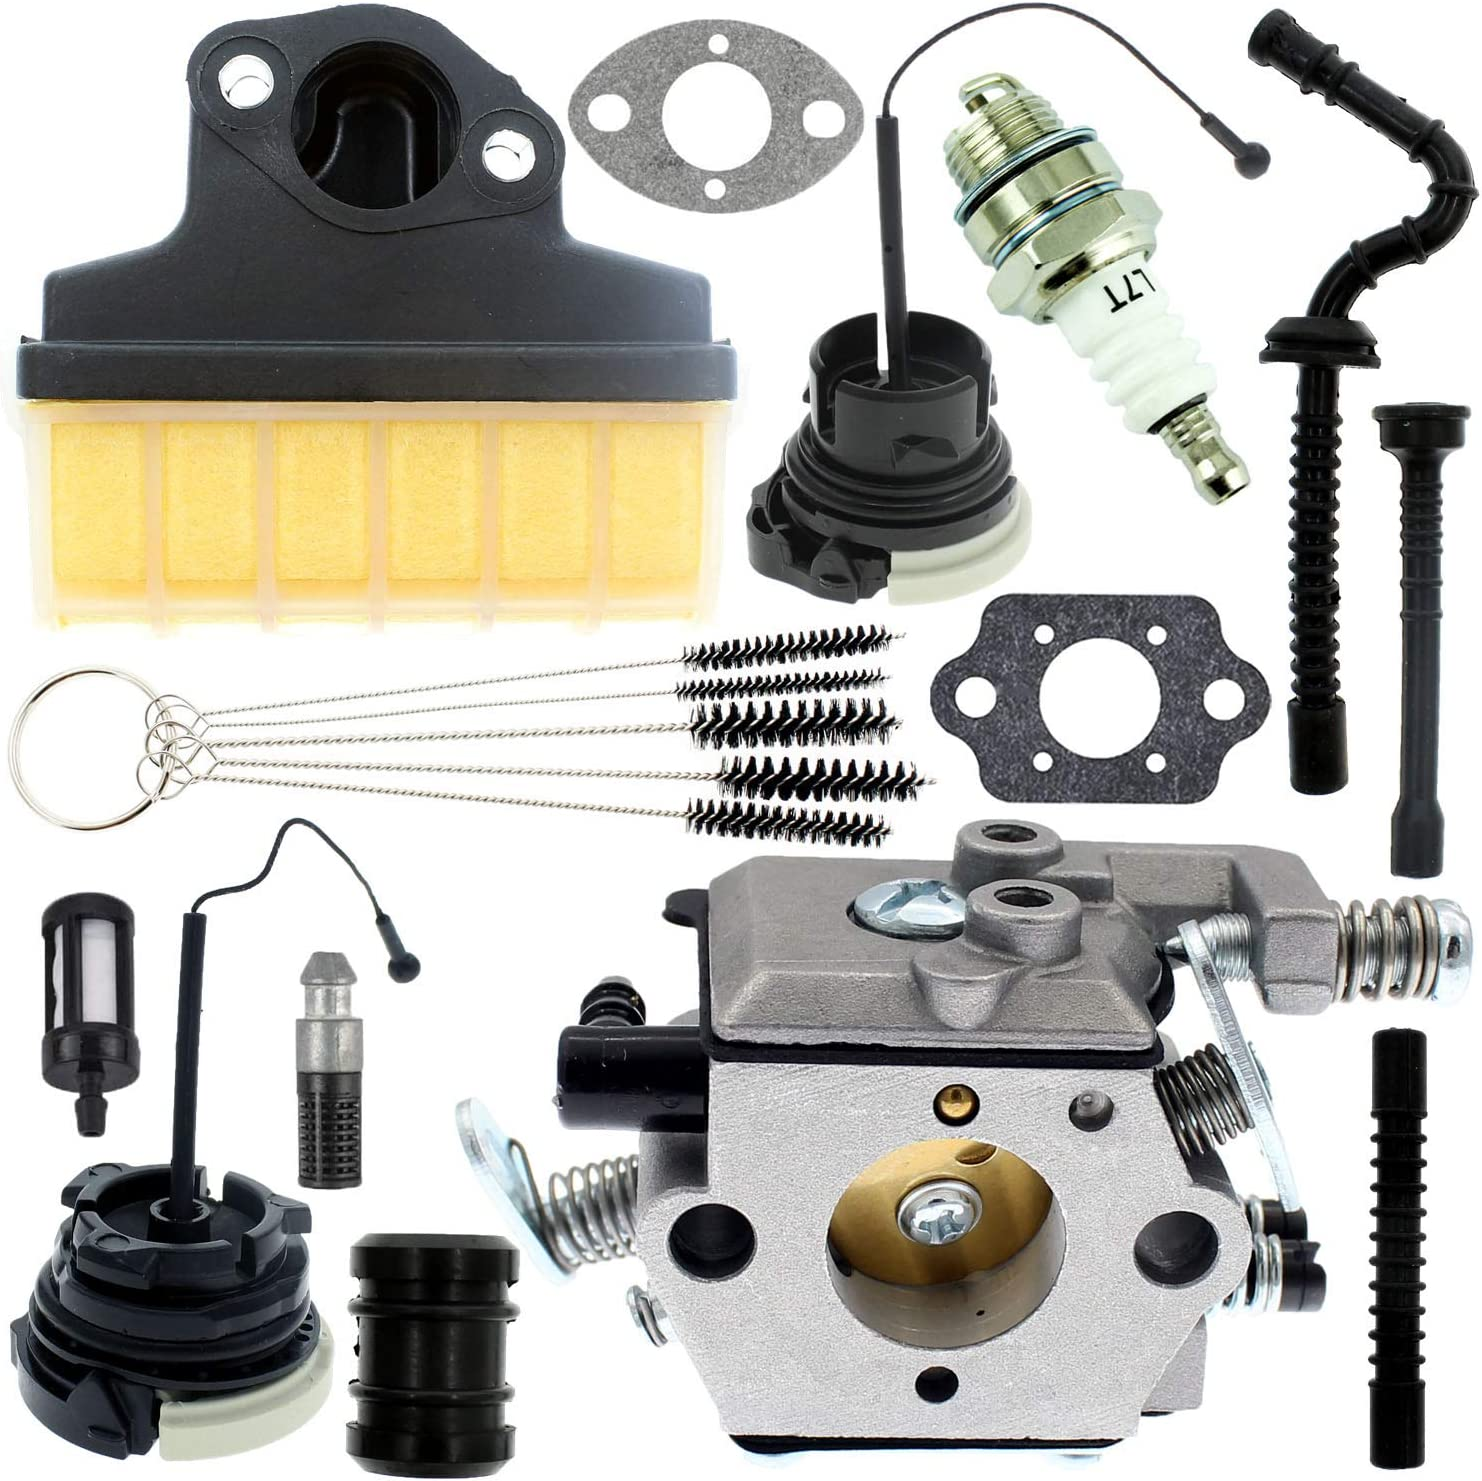 Carburetor Carb Gasket Oil Fuel Filter Line Intake Manifold Inlet Repower Kit for STIHL 021 023 025 MS210 MS230 MS250